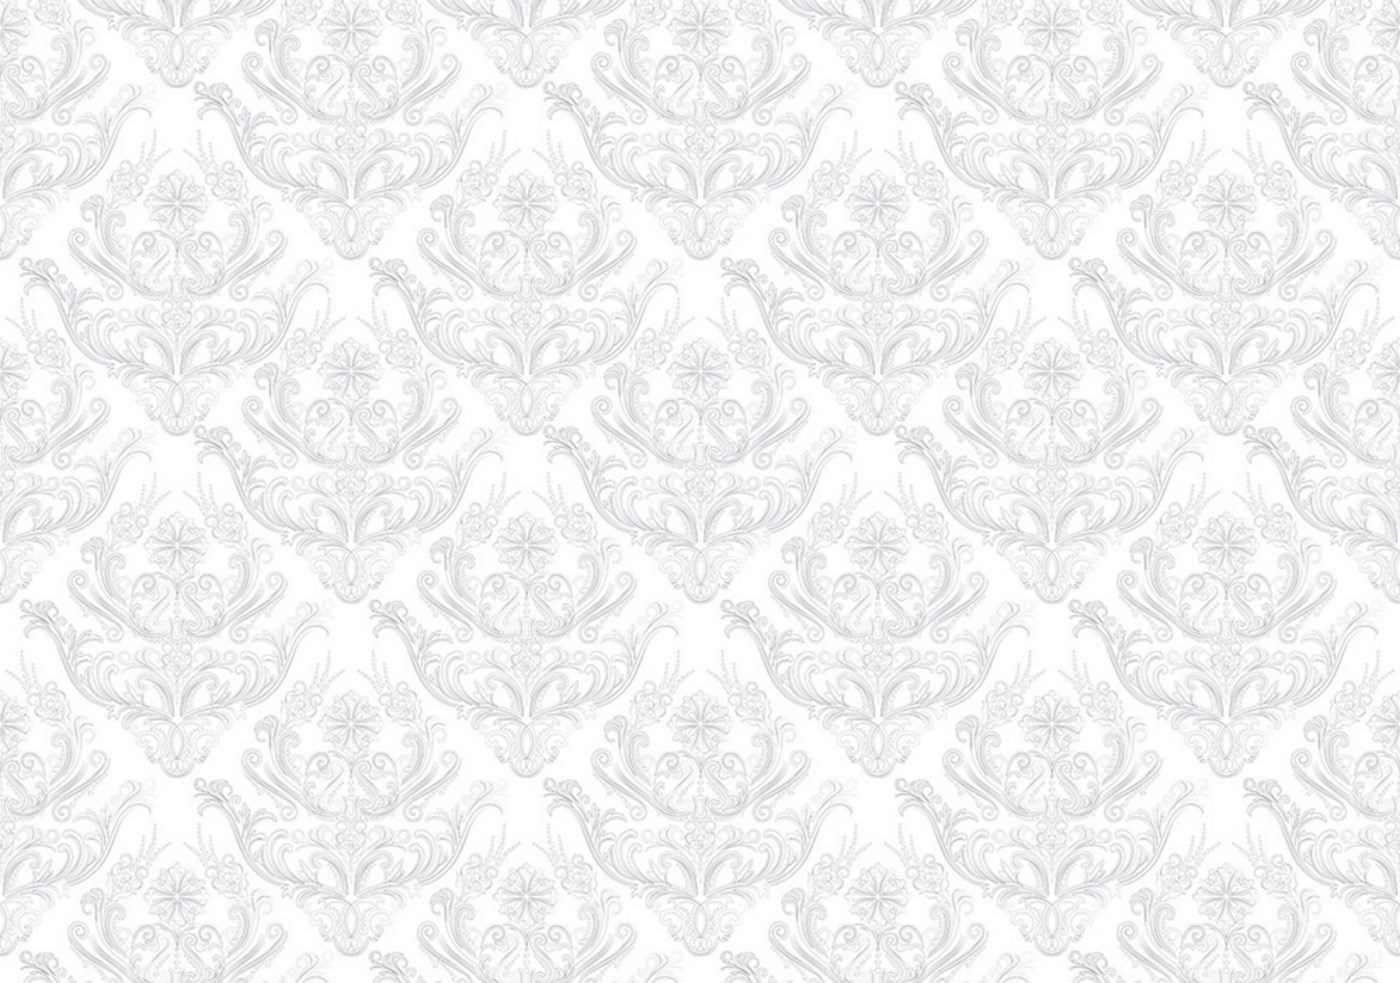 Vlies Fototapete 373   Ornamente Tapete Ornamente Muster Weiß Grau Weiß